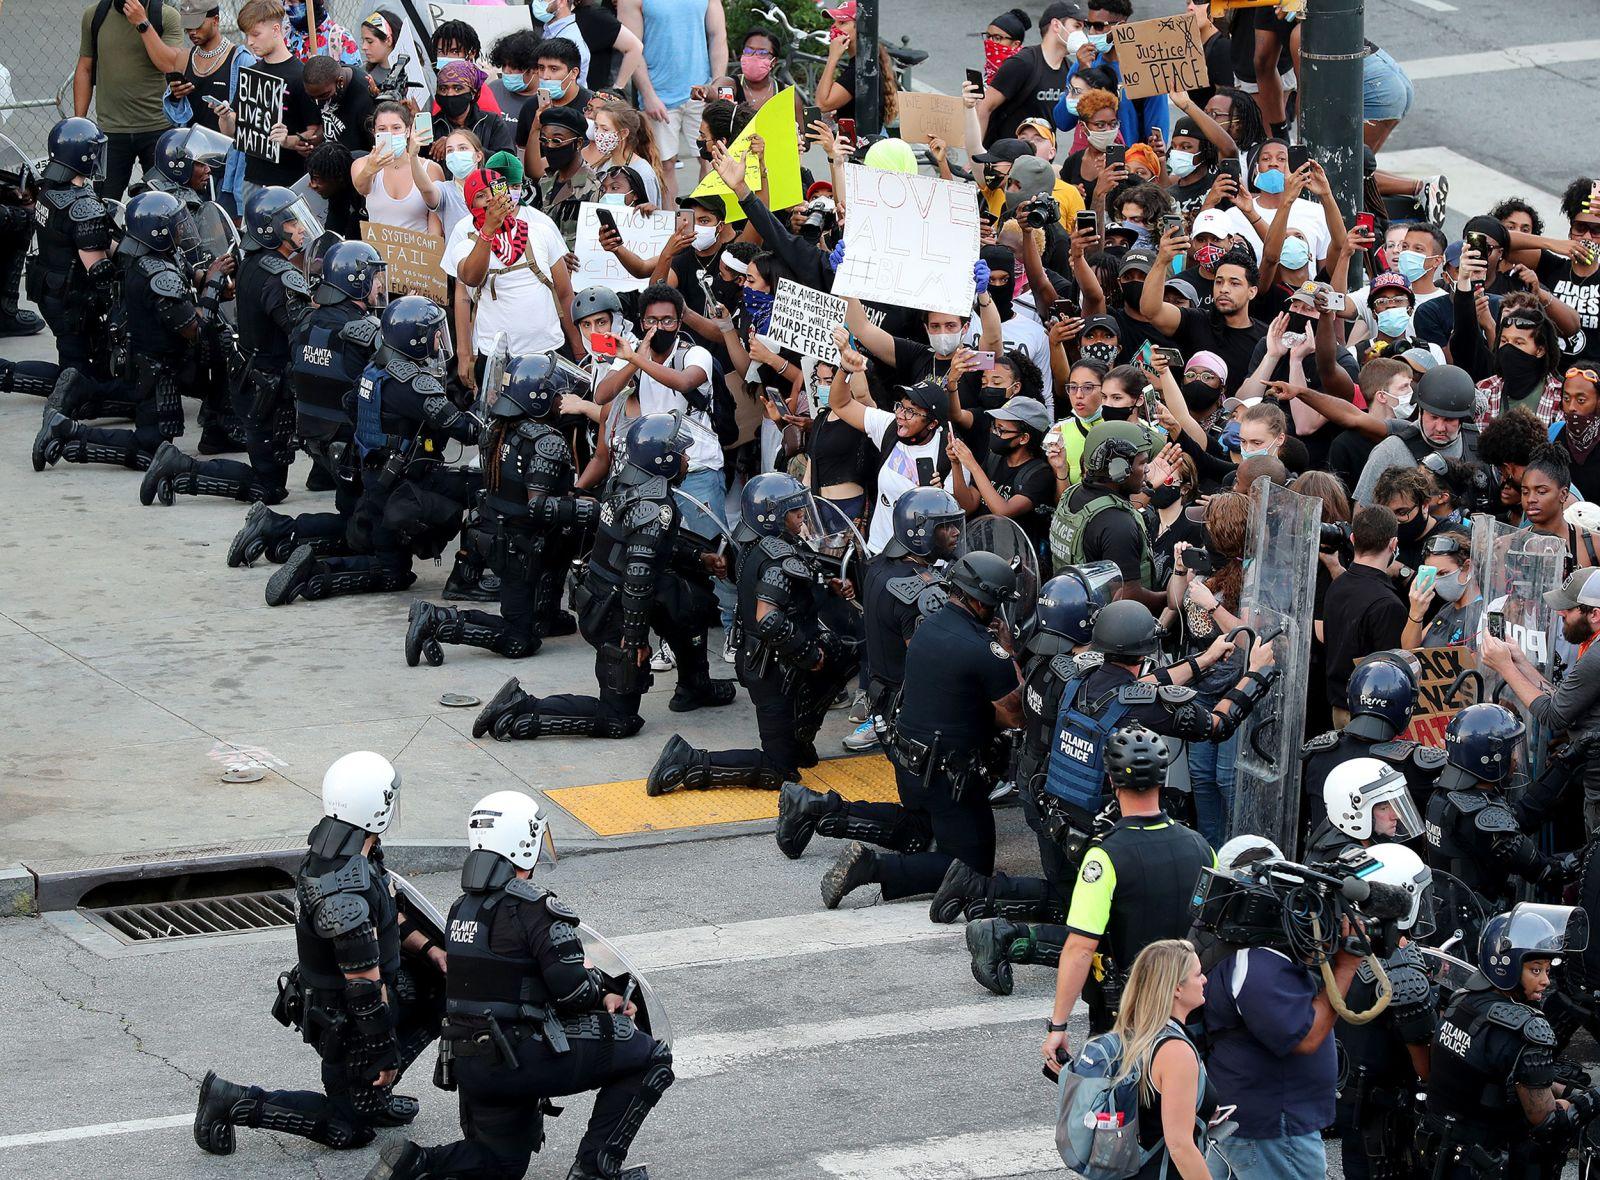 Atlanta on June 1.Curtis ComptonAtlanta Journal-Constitution via Sipa USA